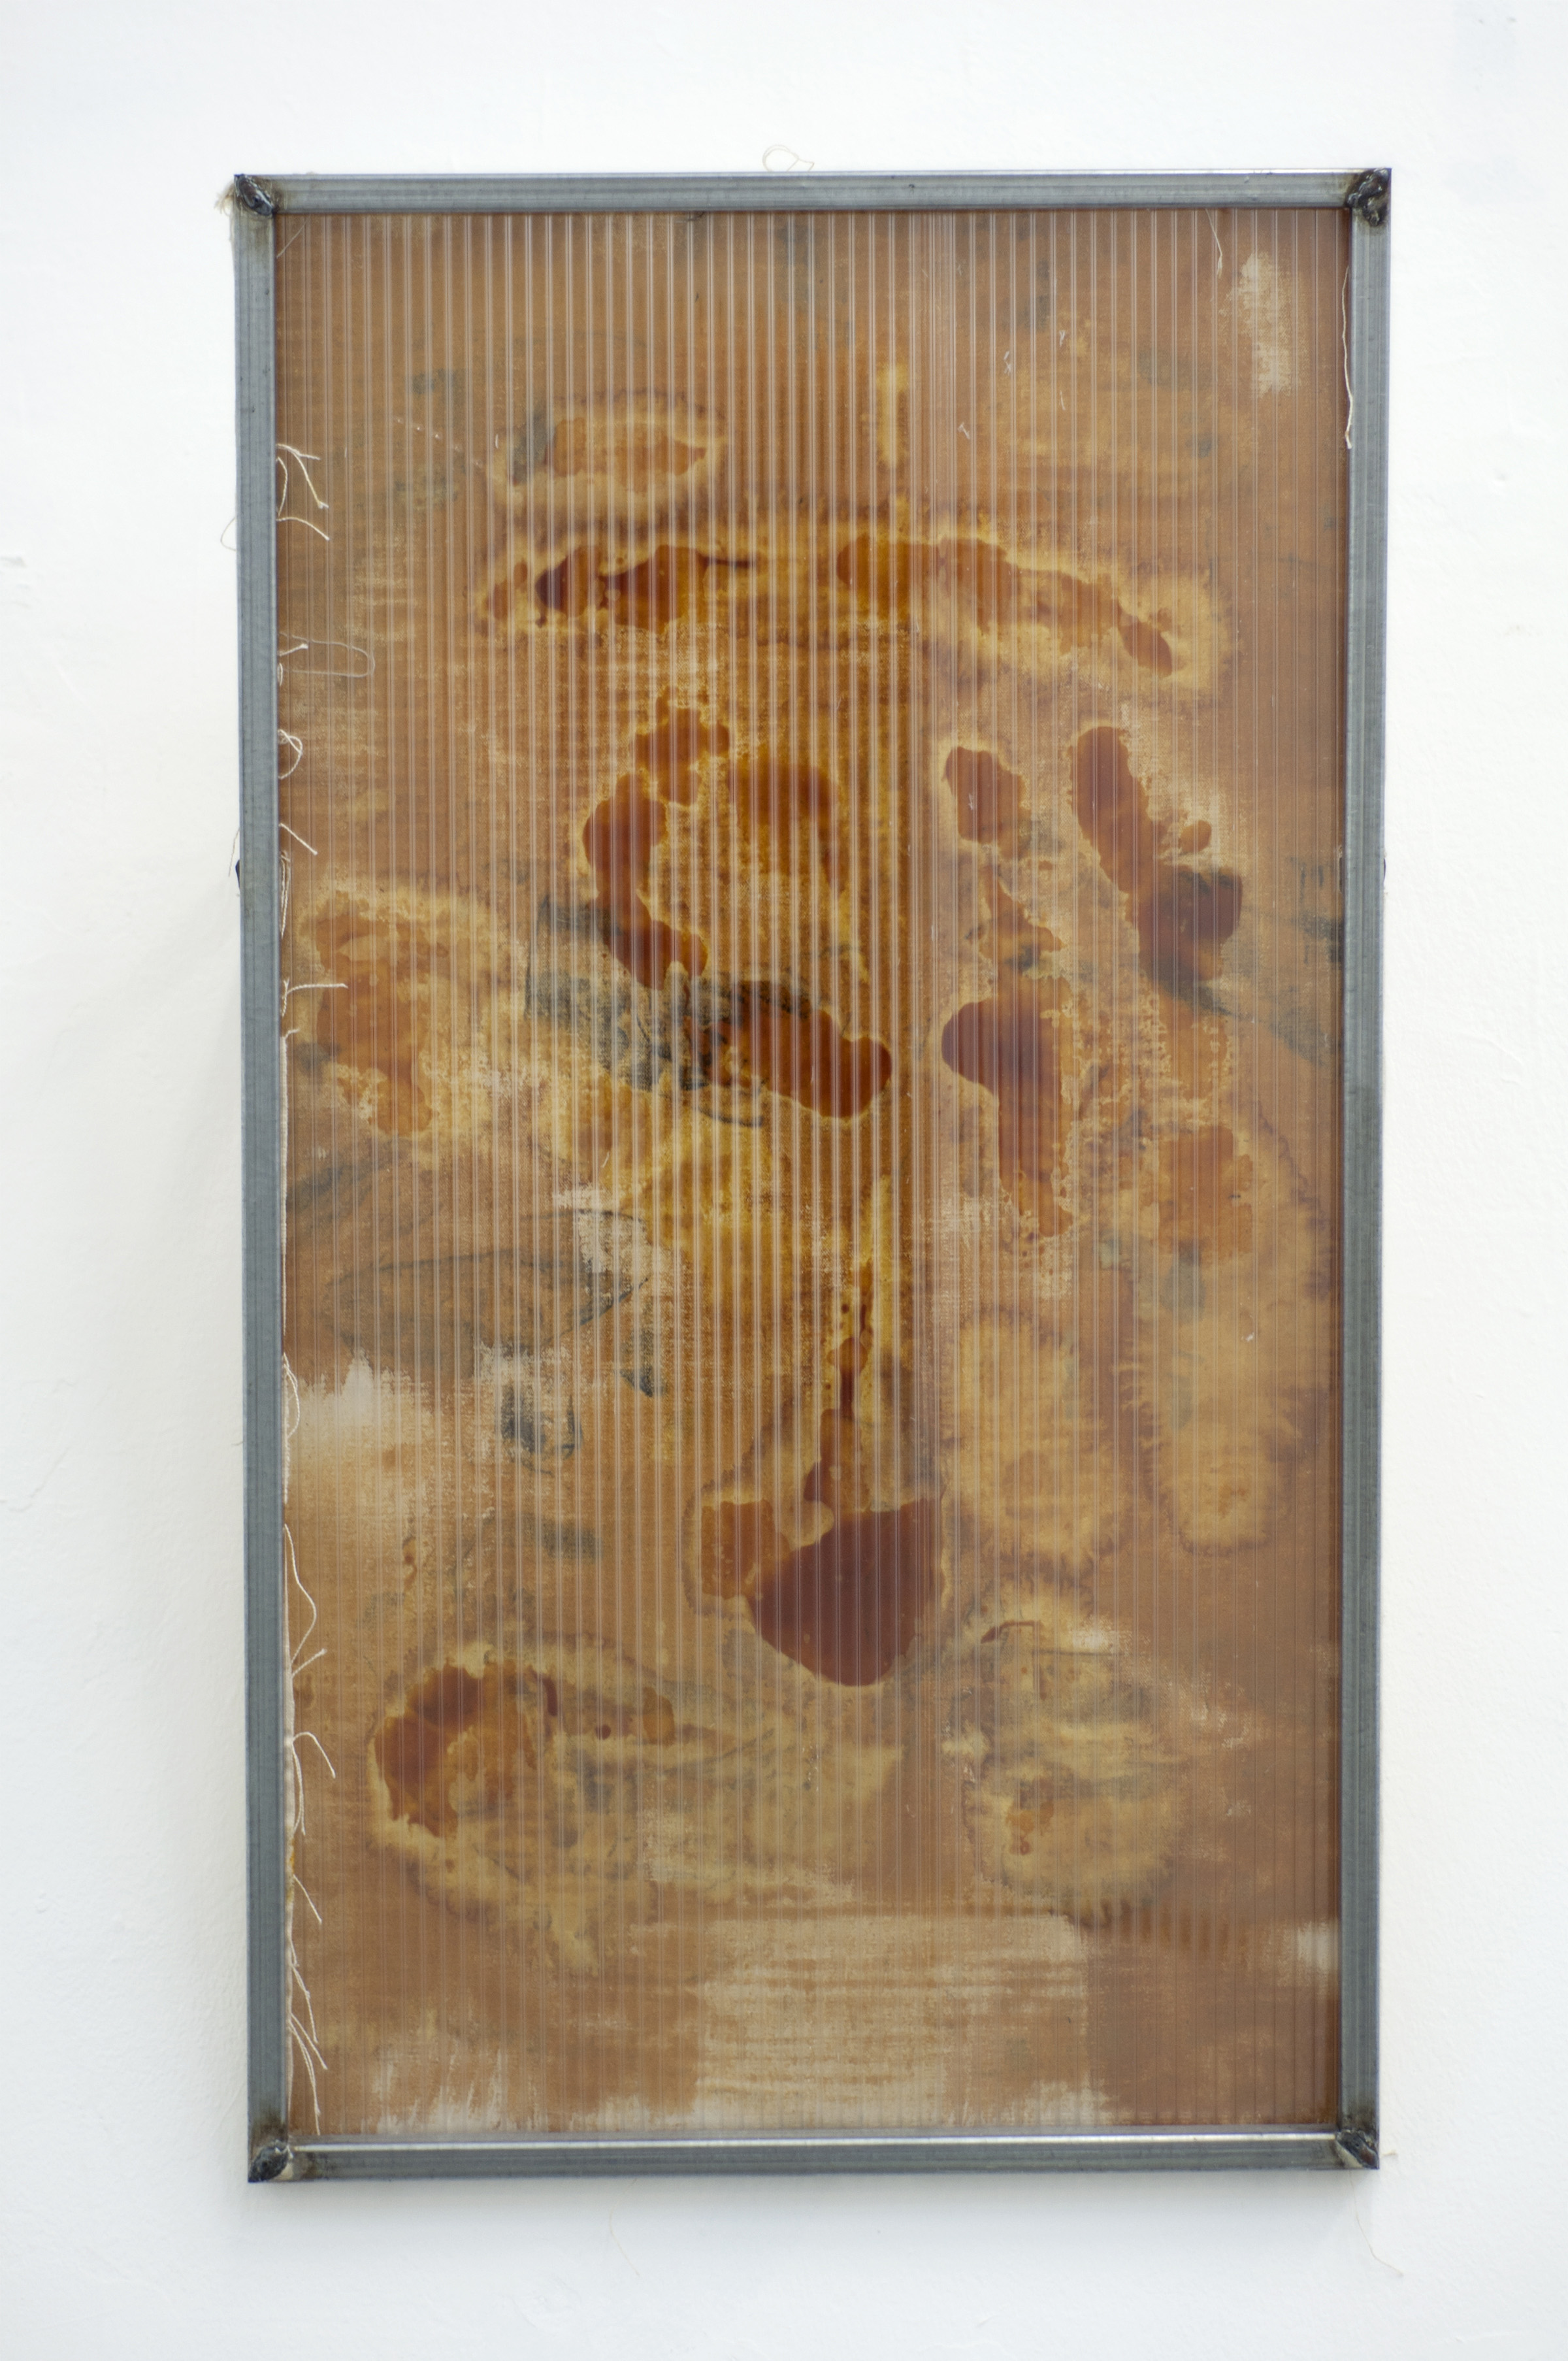 Ishai Shapira Kalter, Module No. 1 galvanized steel, grease, iodine, polycarbonate, screws, canvas, 45x77x20 cm, 2017 (front).jpg